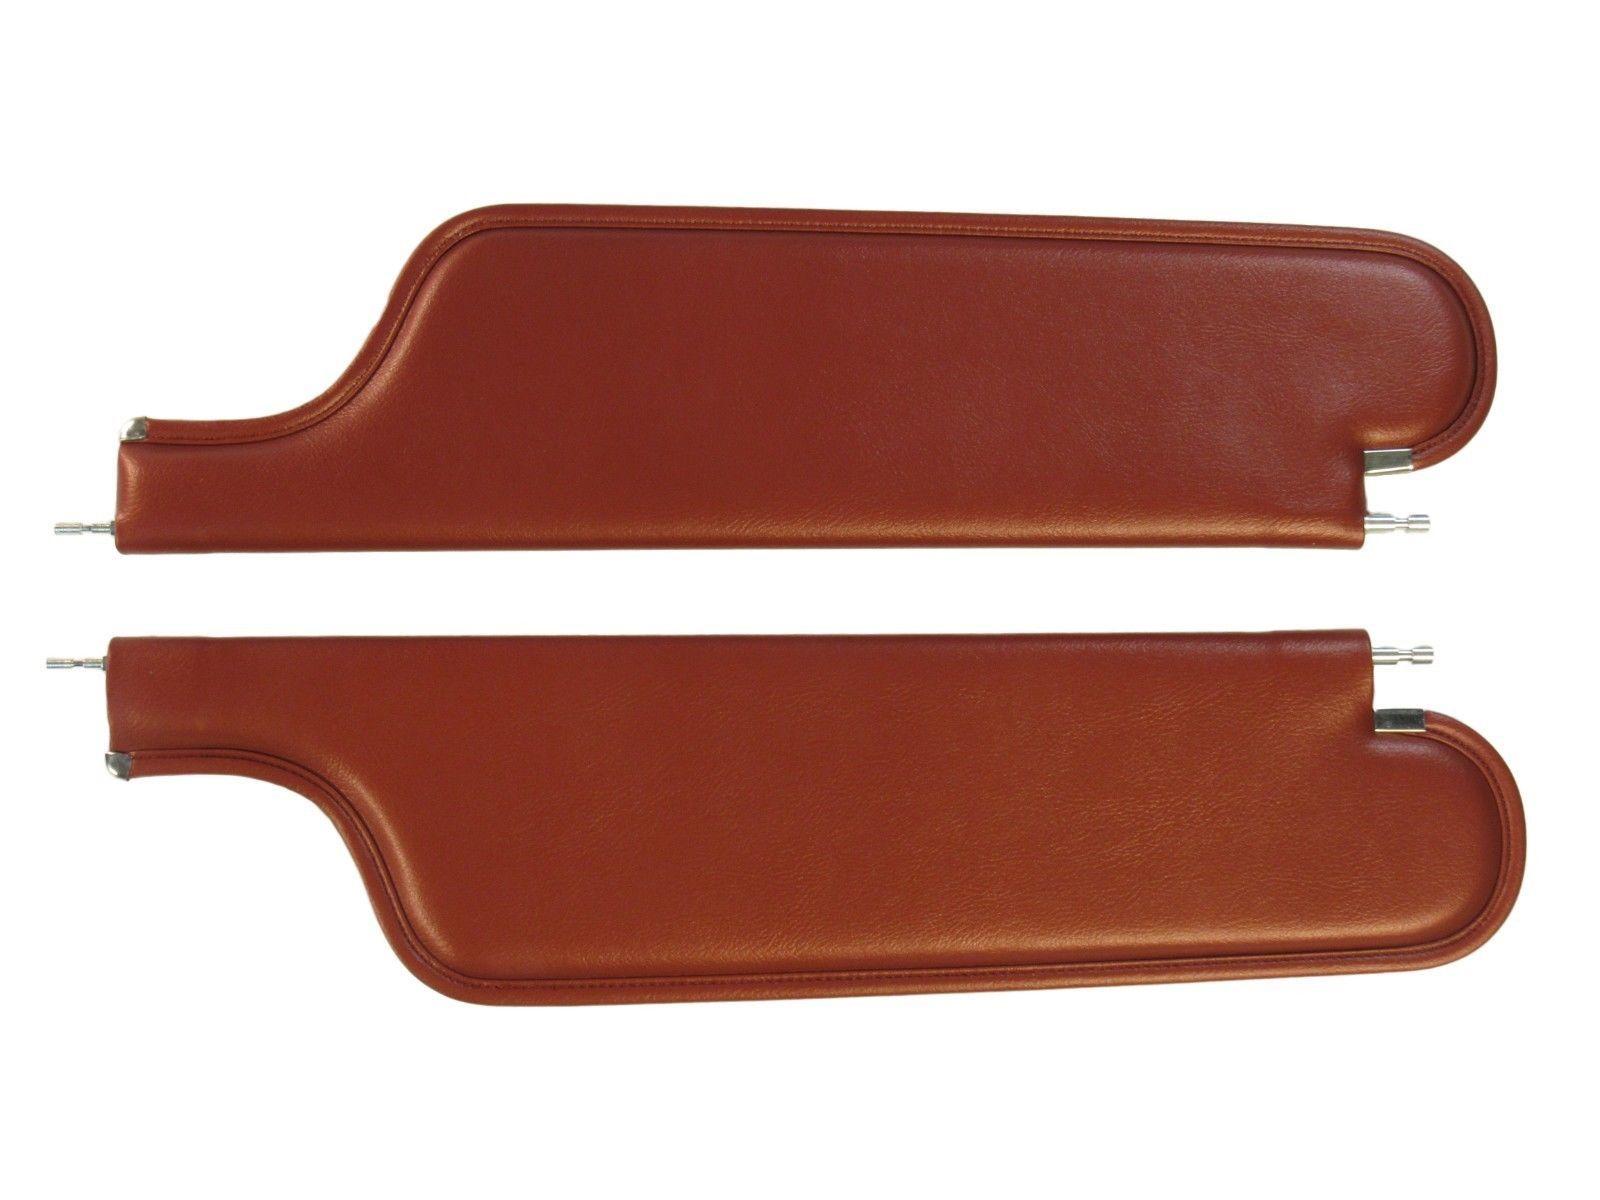 12 COLORS PERFORATED PATTERN 1964-1965 DODGE 2 DOOR SEDAN 5 BOW HEADLINER